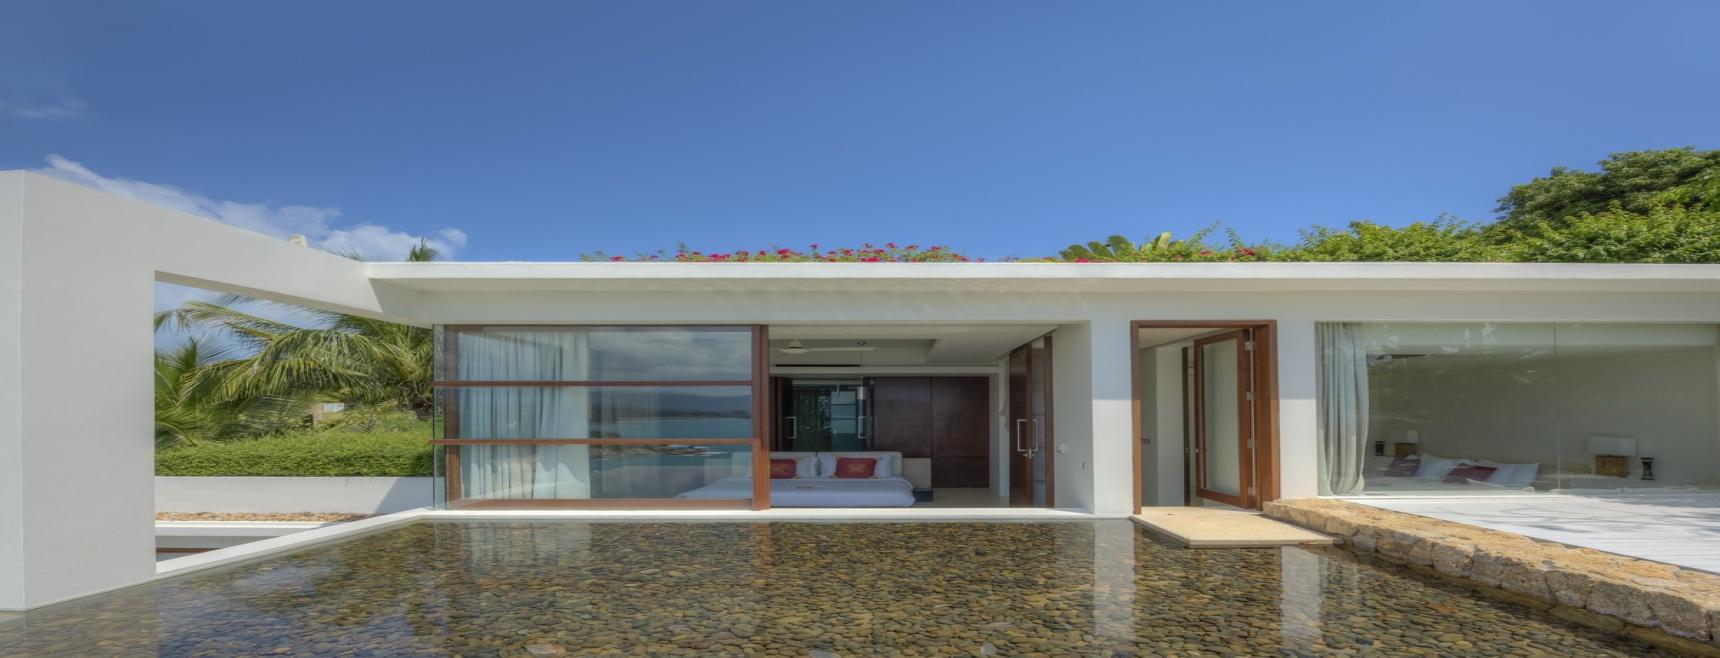 Choeng Mon, North East, Koh Samui, 4 Bedrooms Bedrooms, ,Villa,Holiday Villa Rentals,1111